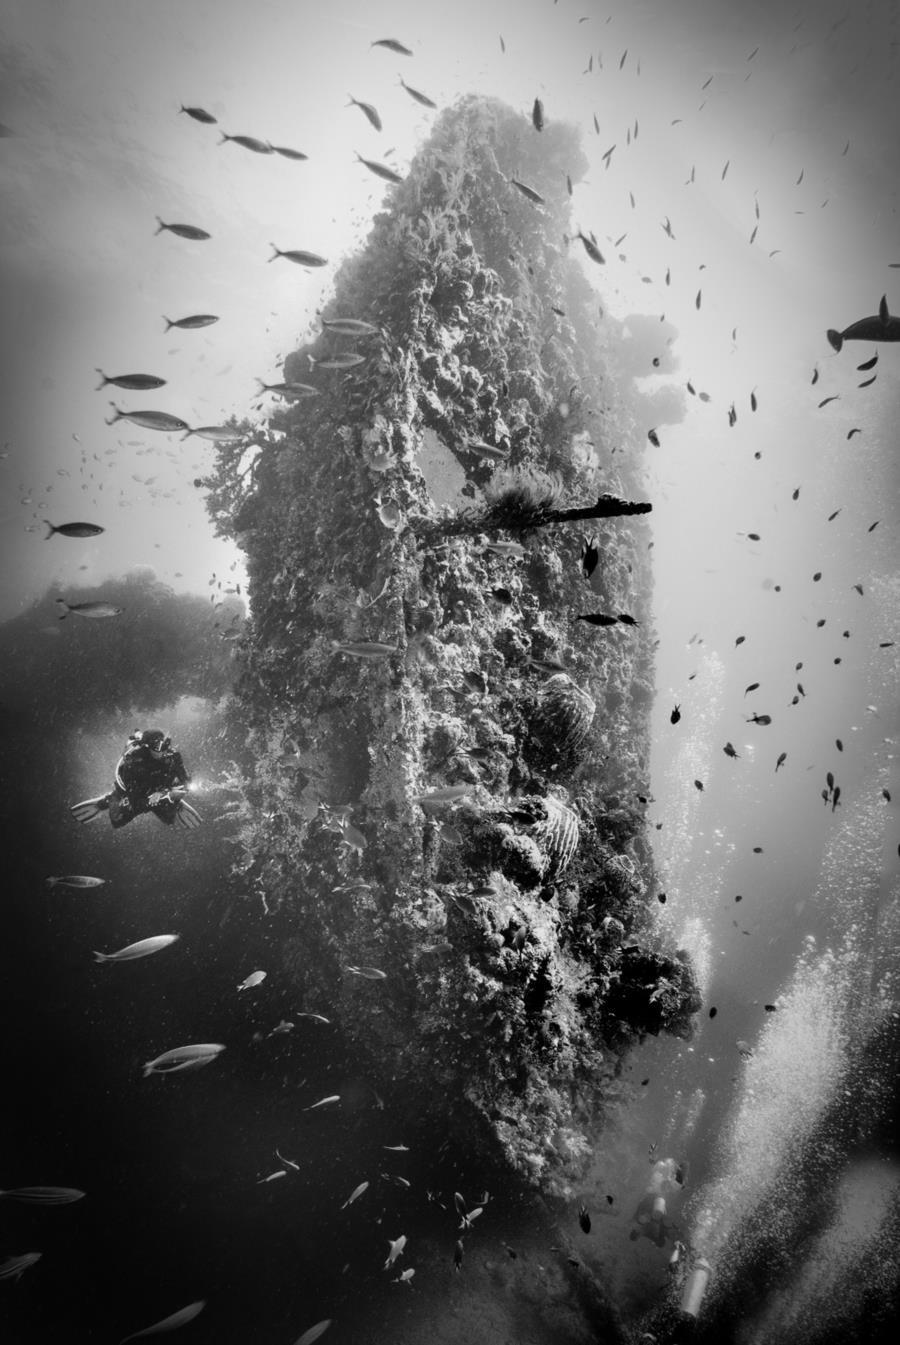 USAT Liberty - Liberty Wreck Bali